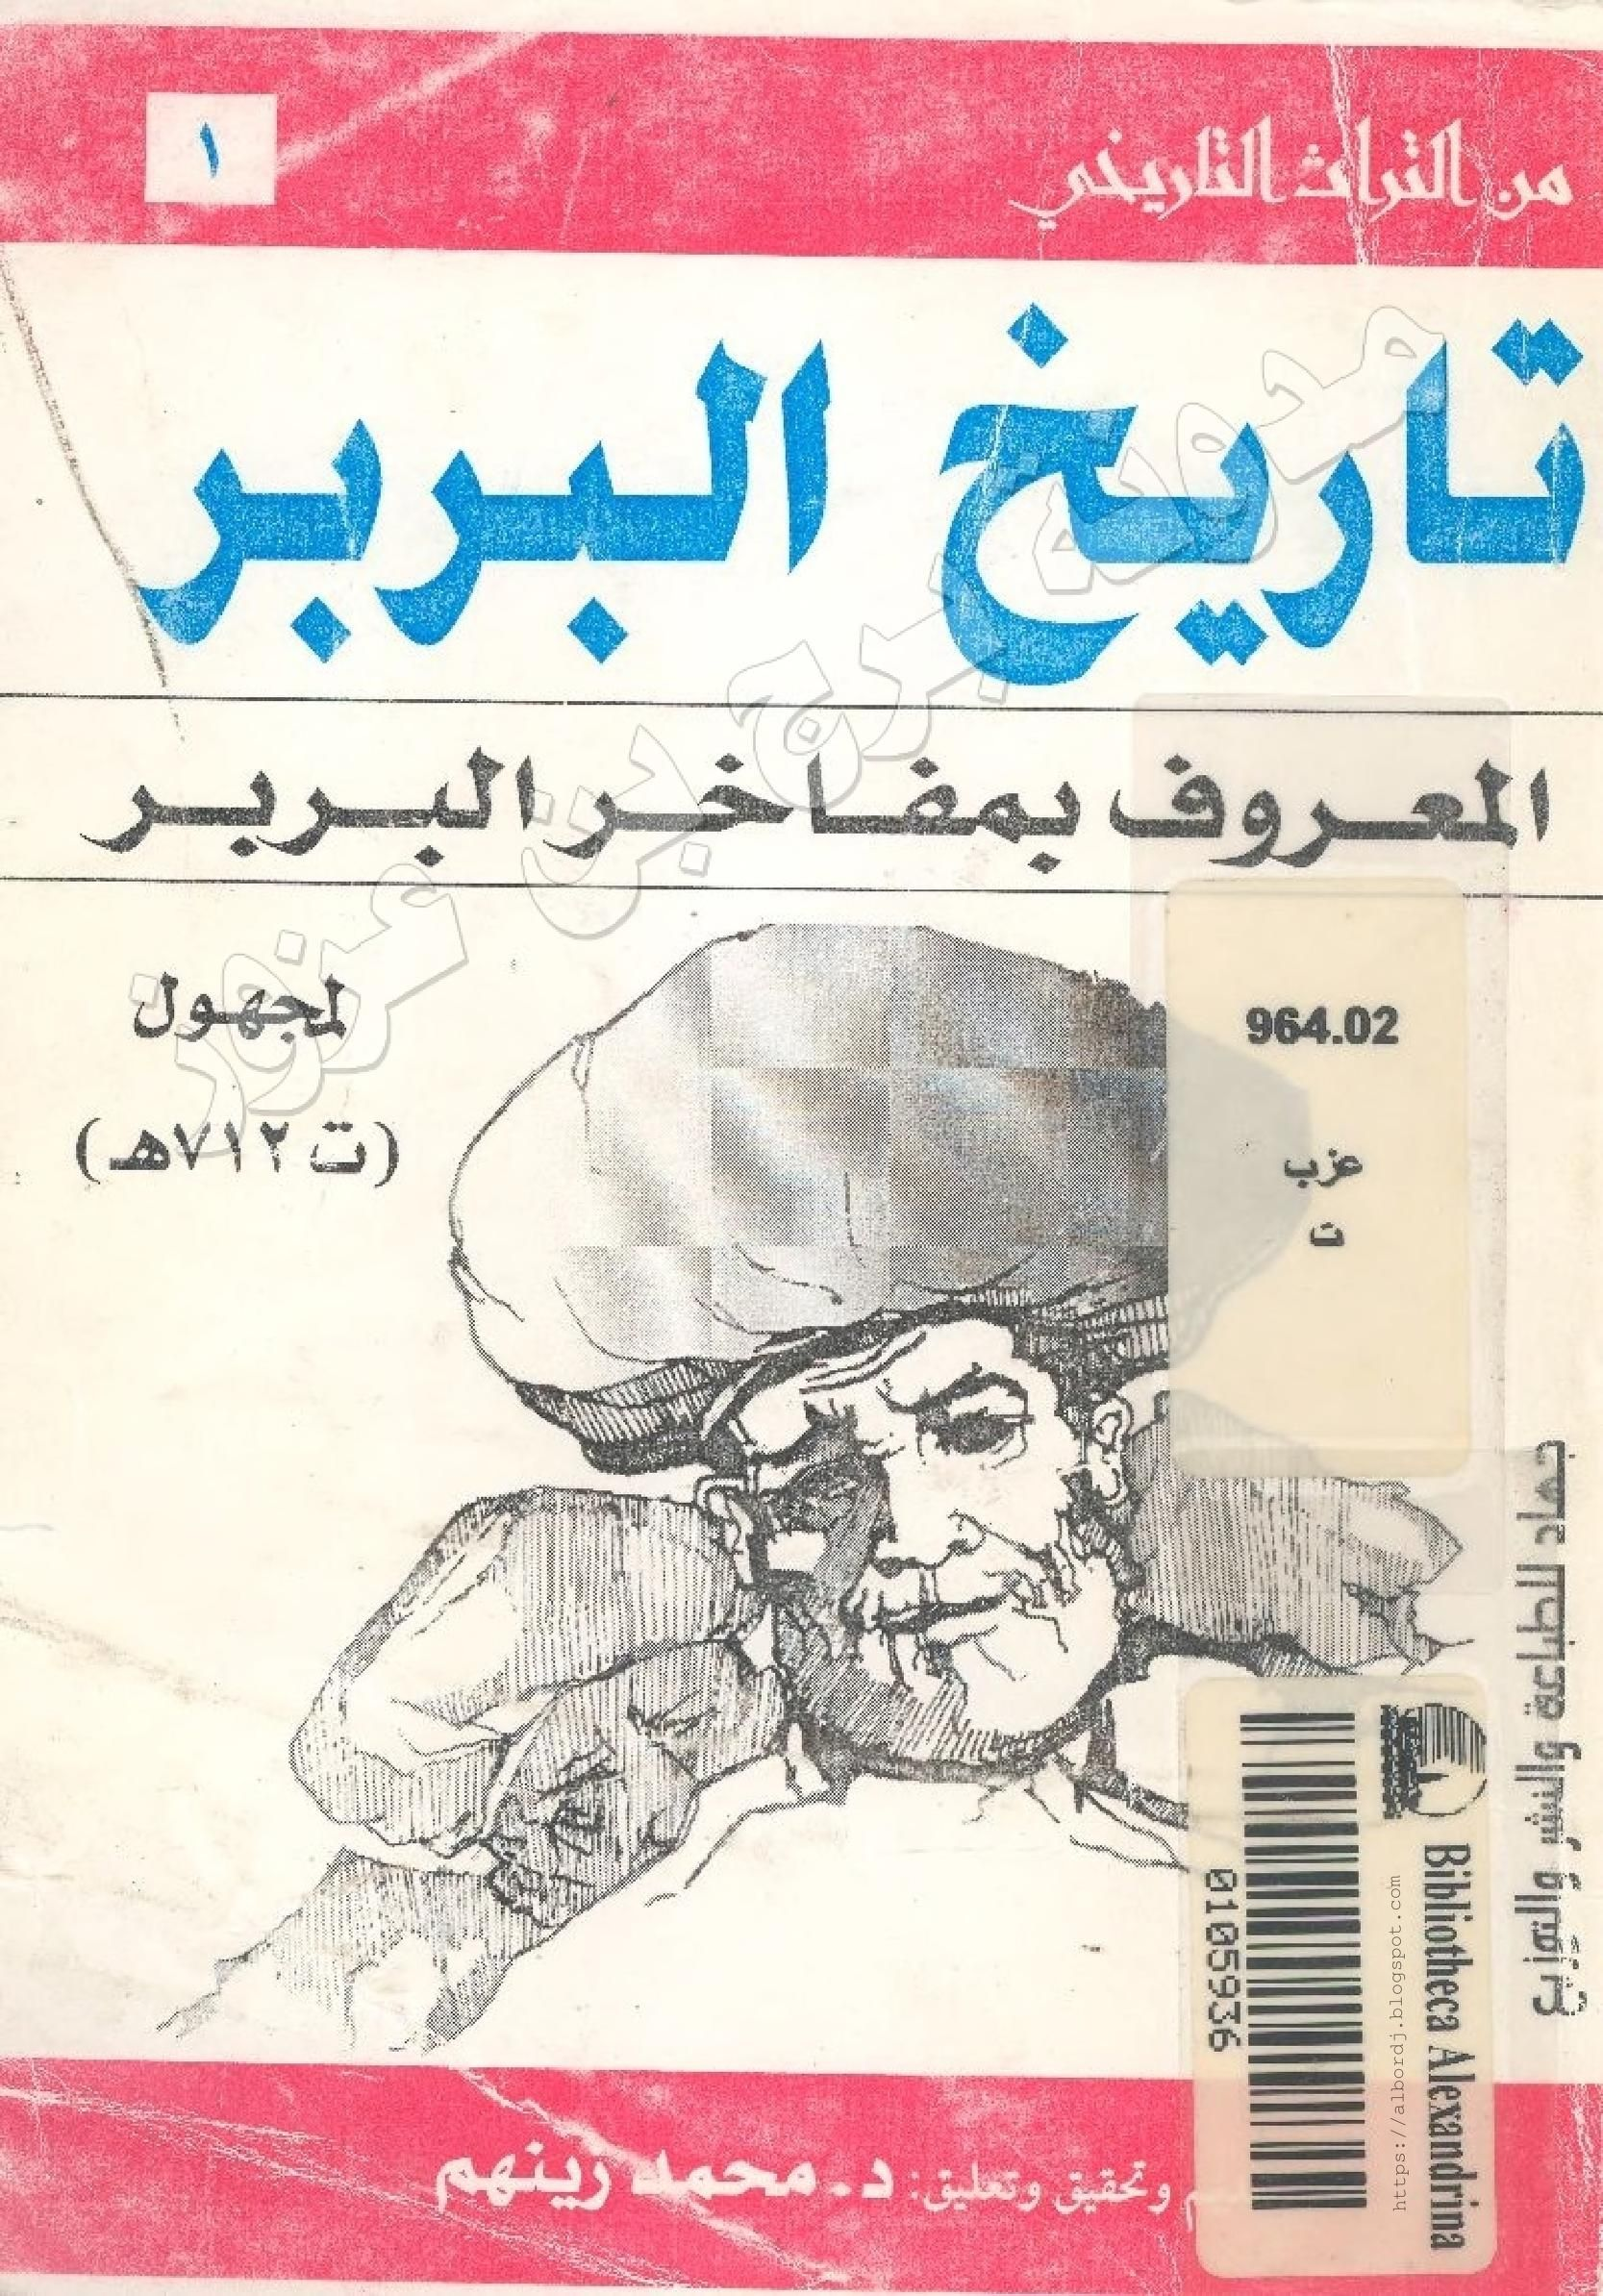 كتاب تاريخ البربر المعروف بمفاخر البربر Free Download Borrow And Streaming Internet Archive Pdf Books Reading Arabic Books Books